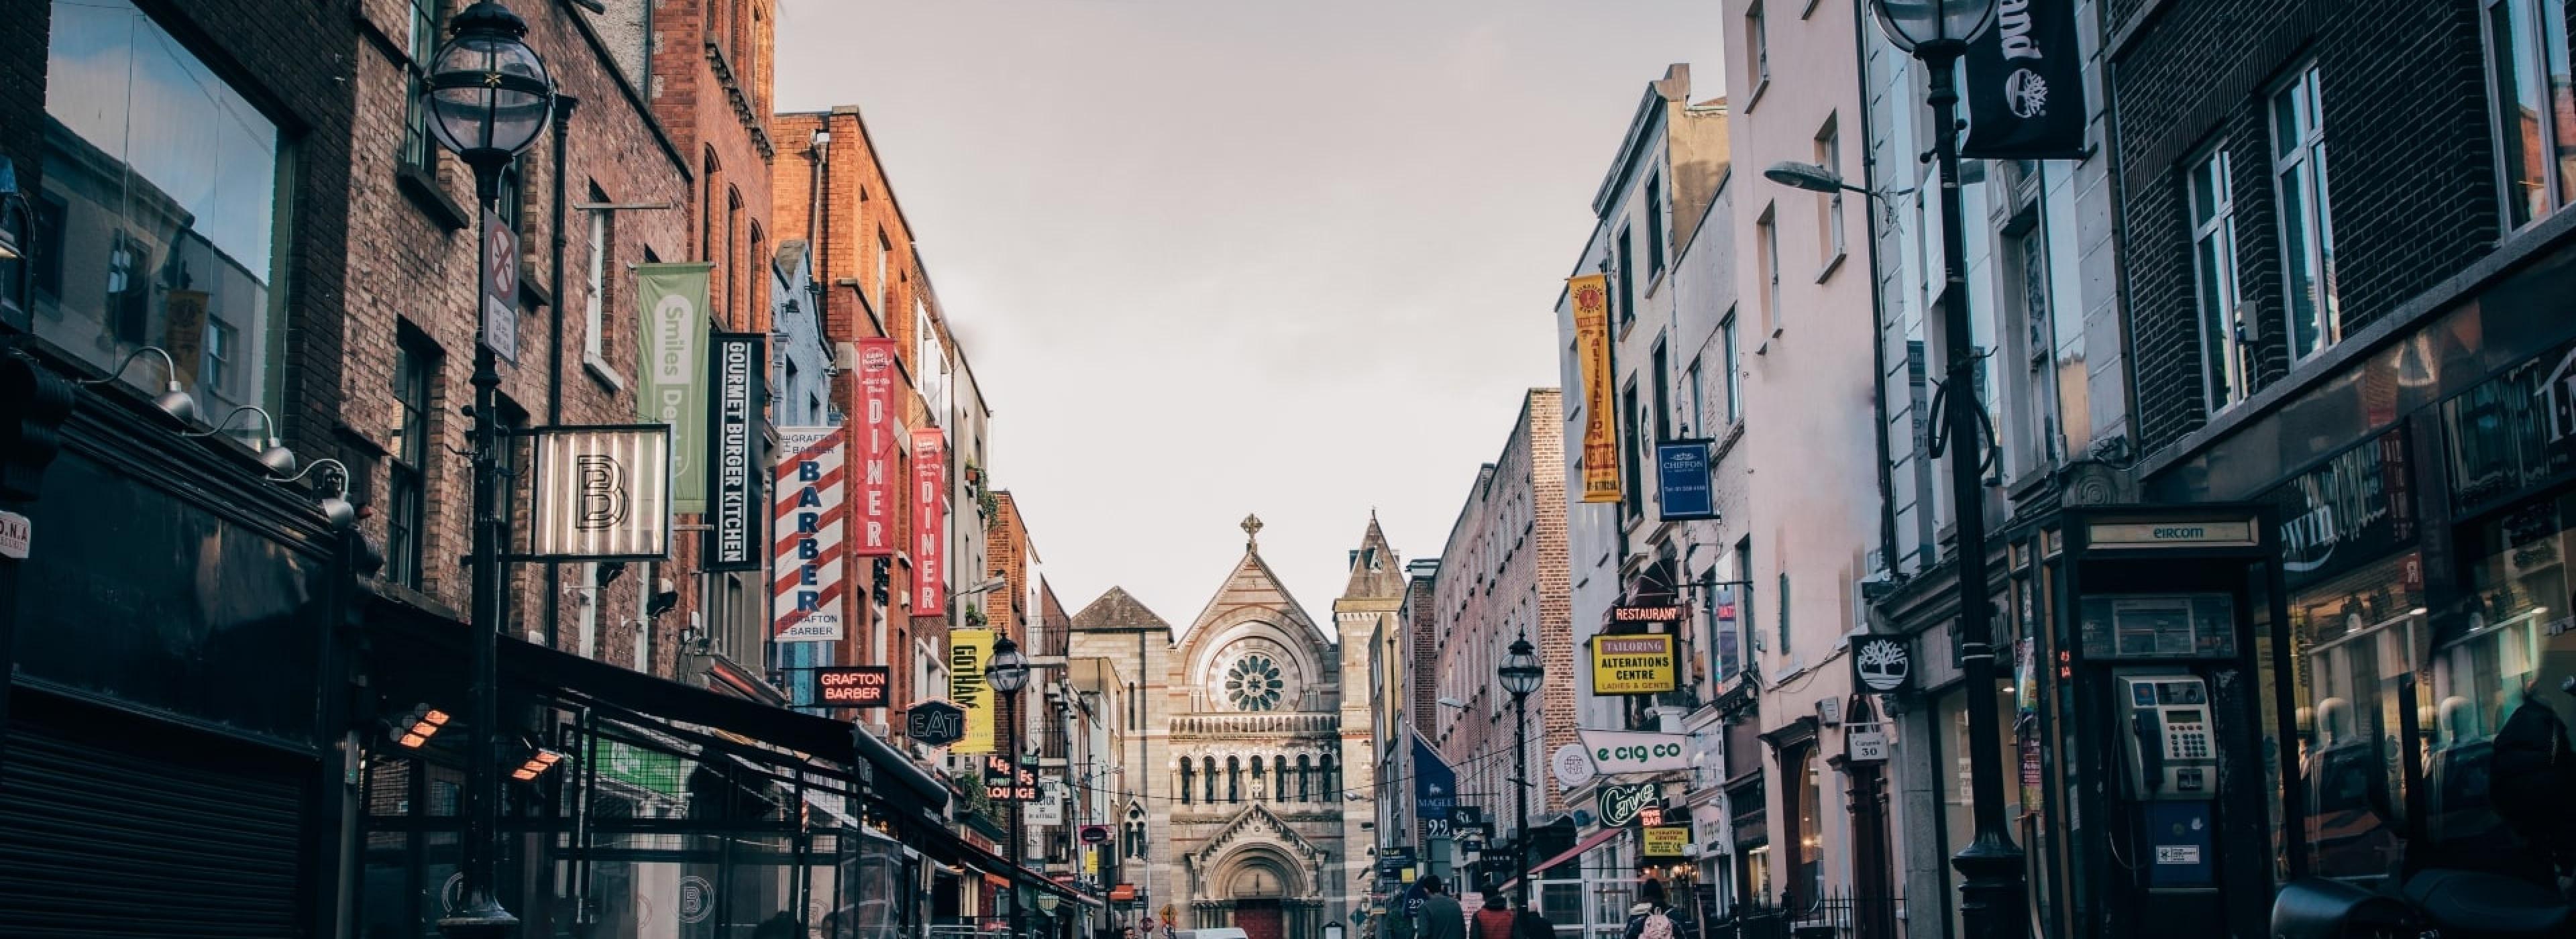 Heritage of Ireland